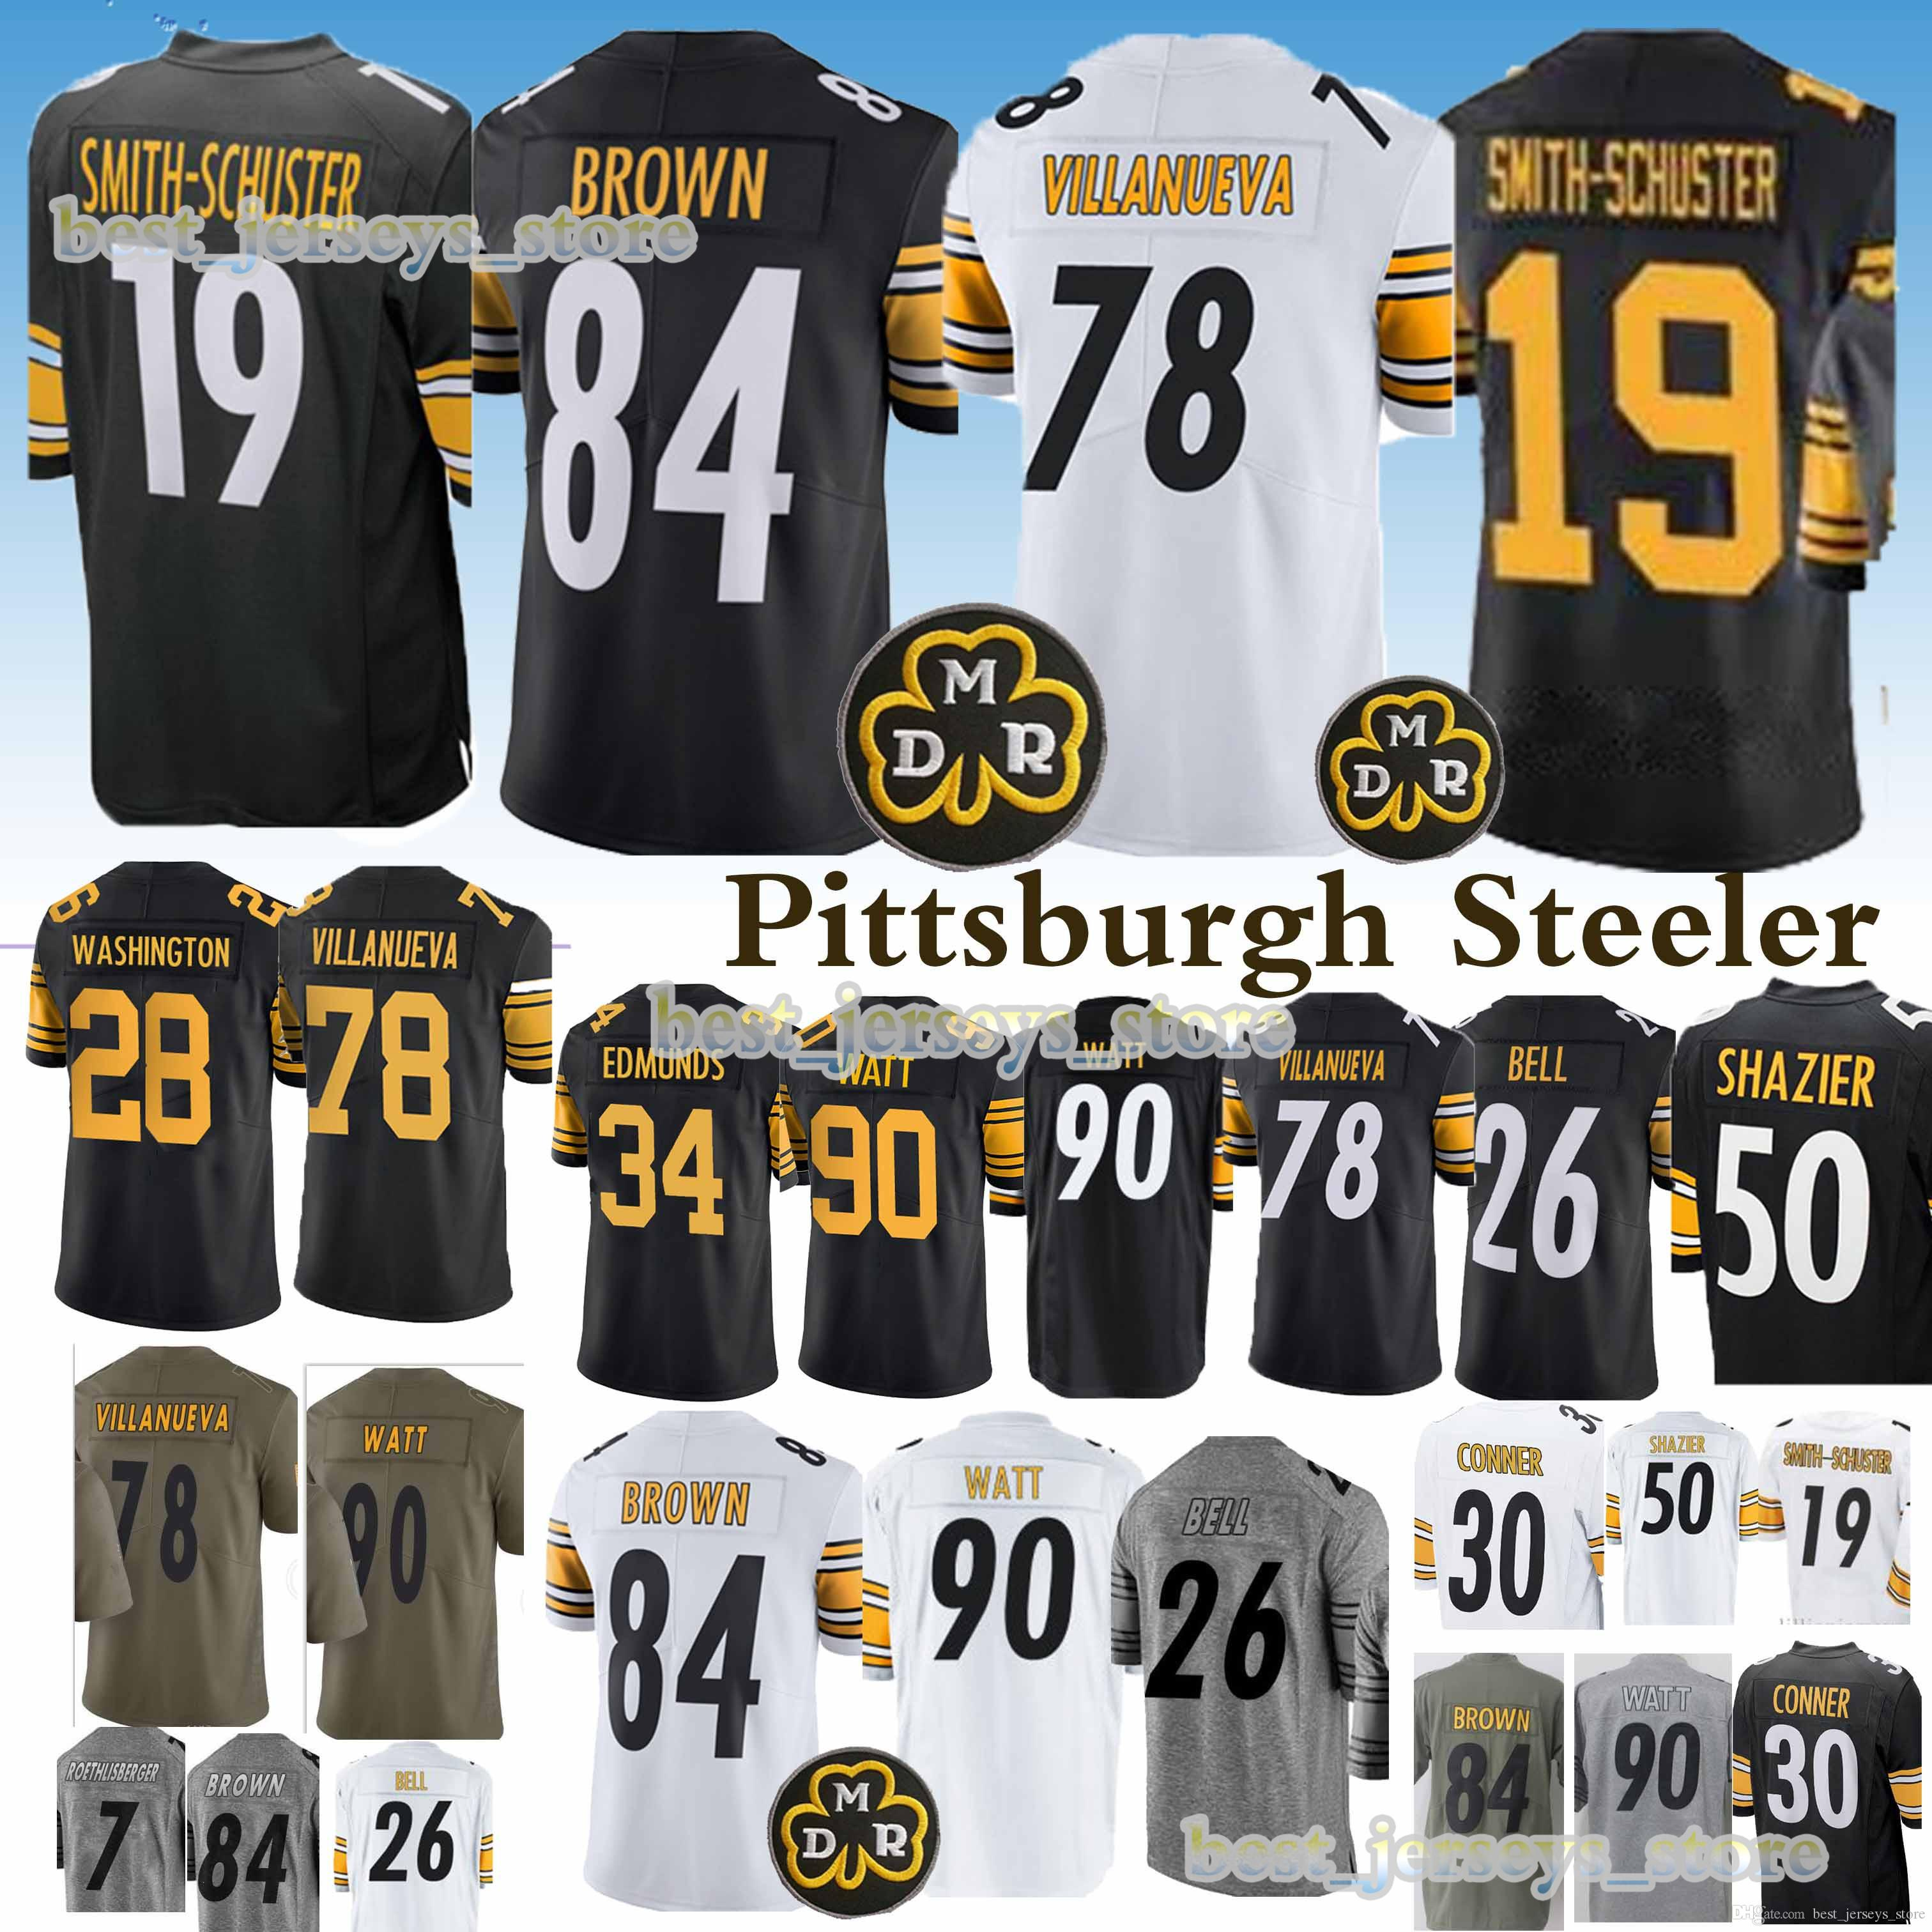 quality design e6e91 7ab7a 84 Antonio Brown 78 Alejandro Villanue Pittsburgh 33 Steeler jerseys 19  Juju Smith-Schuster 90 T.J. Watt jersey 2019 Design sweater